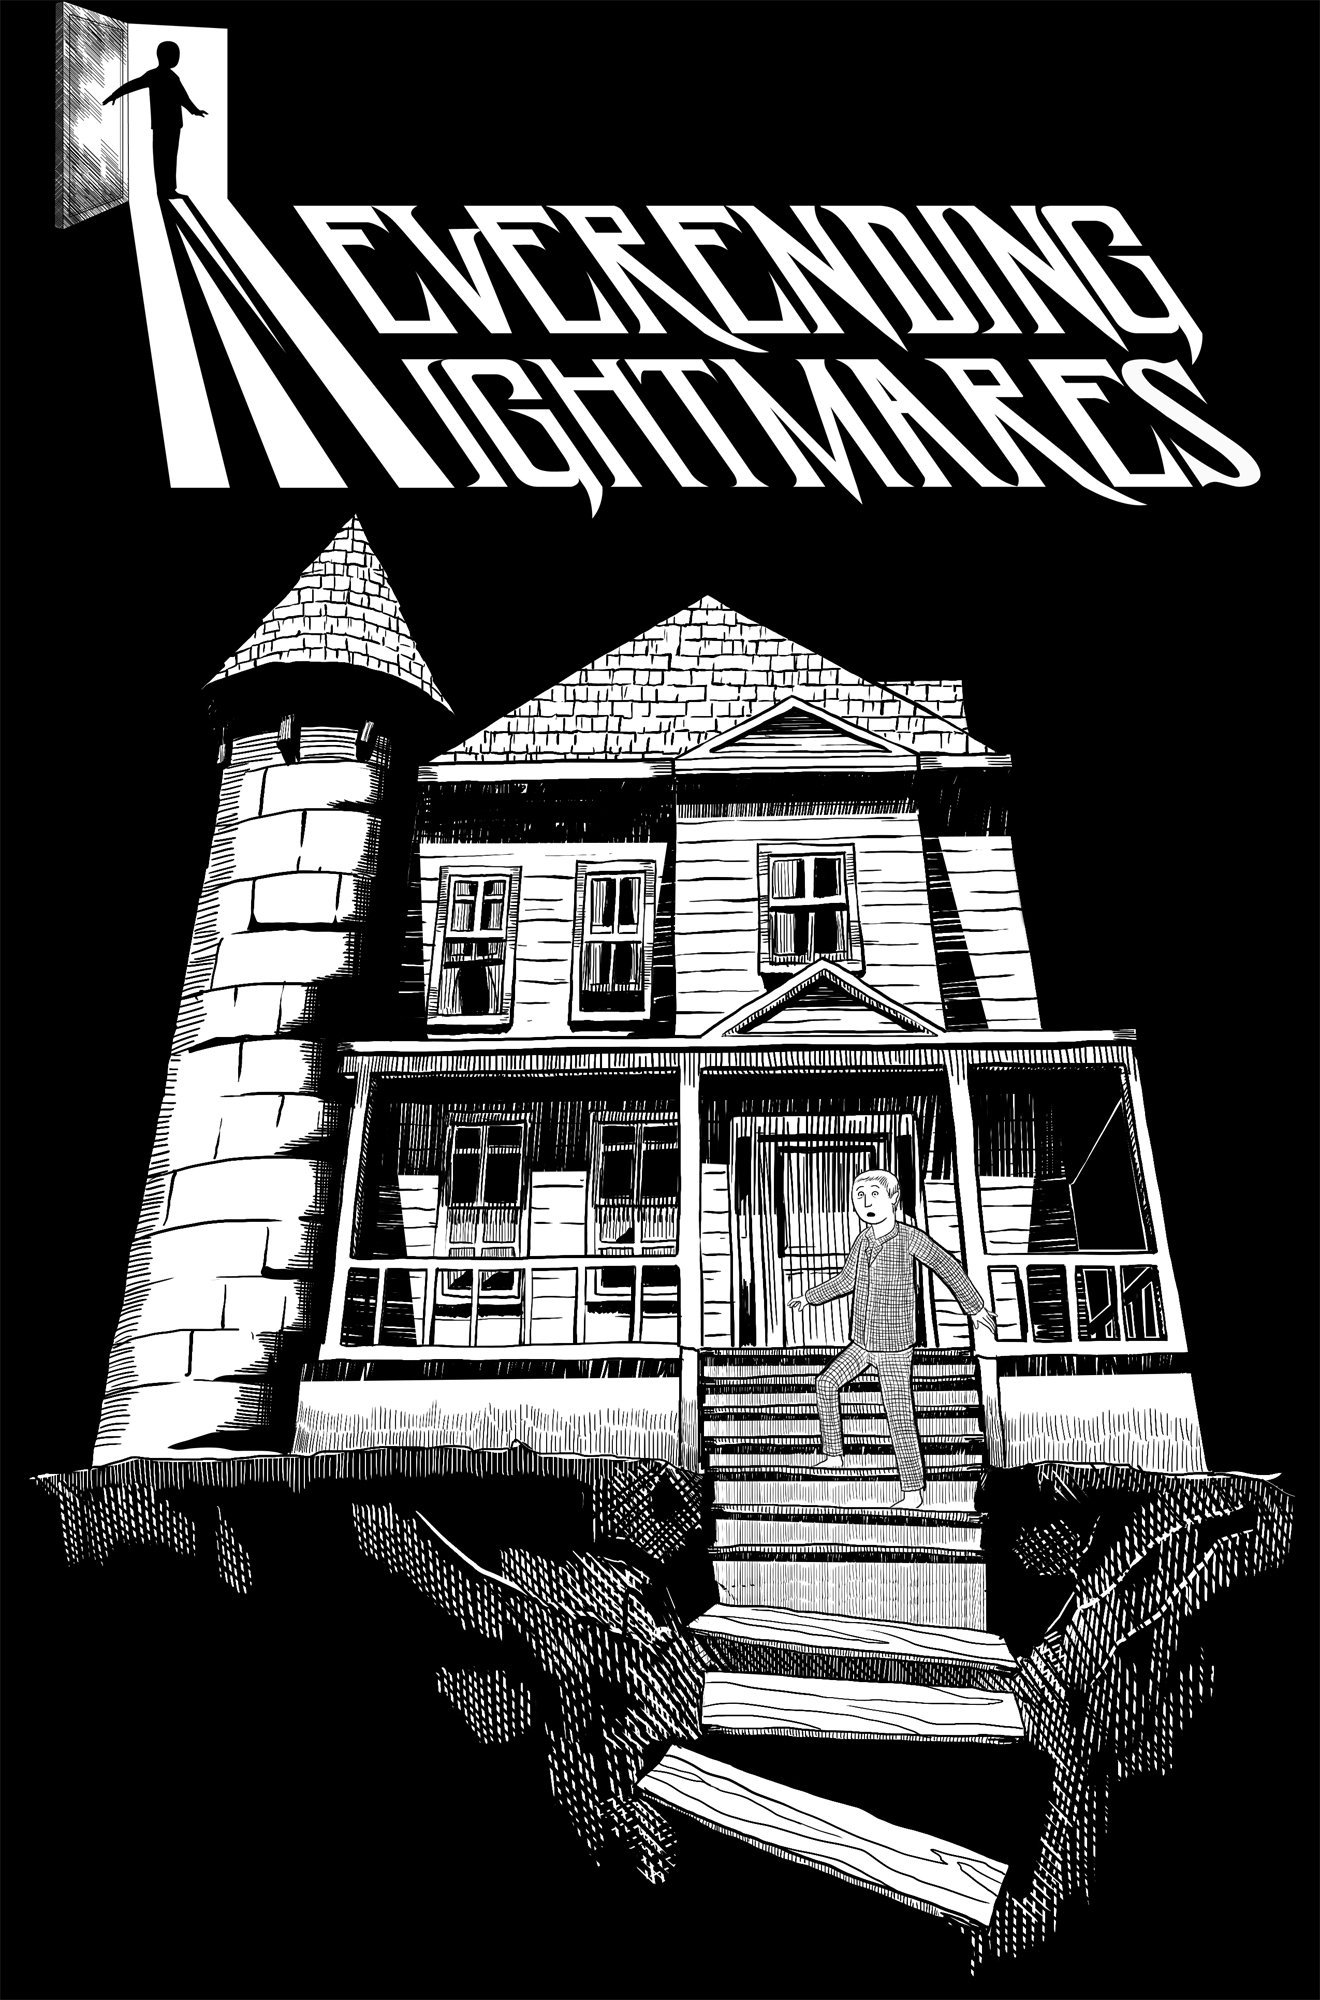 Neverending Nightmares v.3.3.22468 [GOG] (2014) (2014)